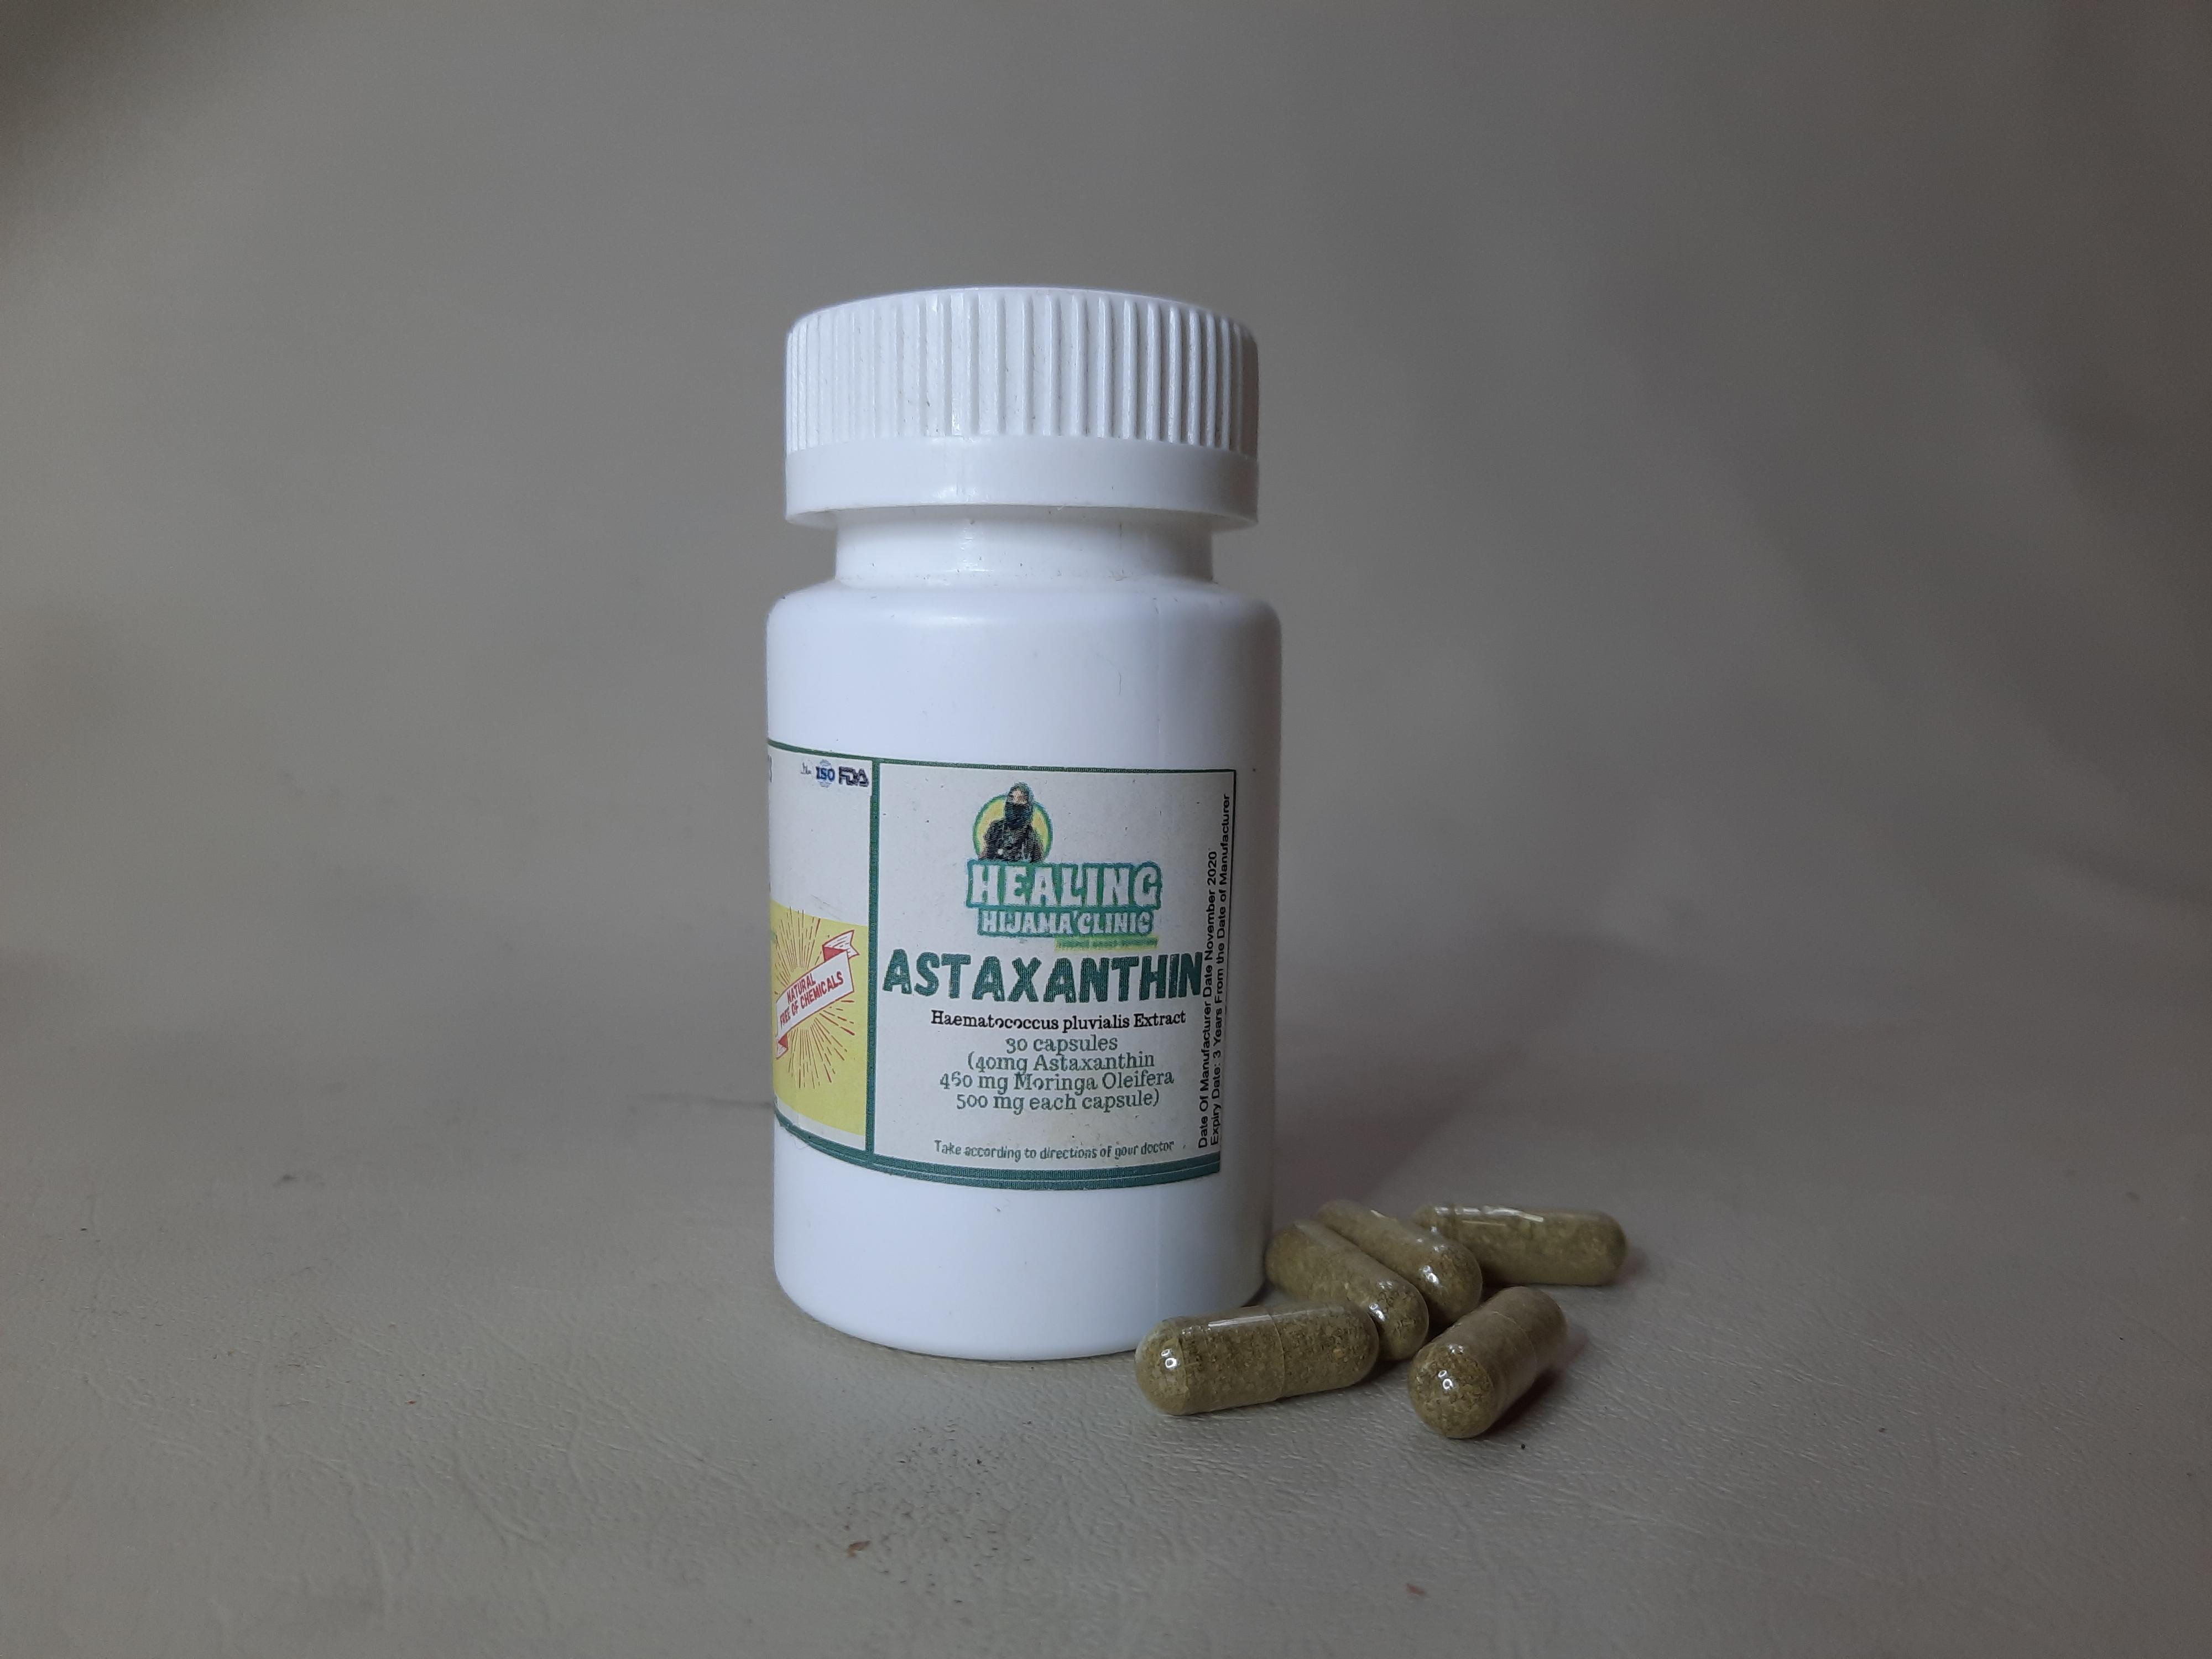 ASTAXANTHIN 40 mg with moringa 460mg